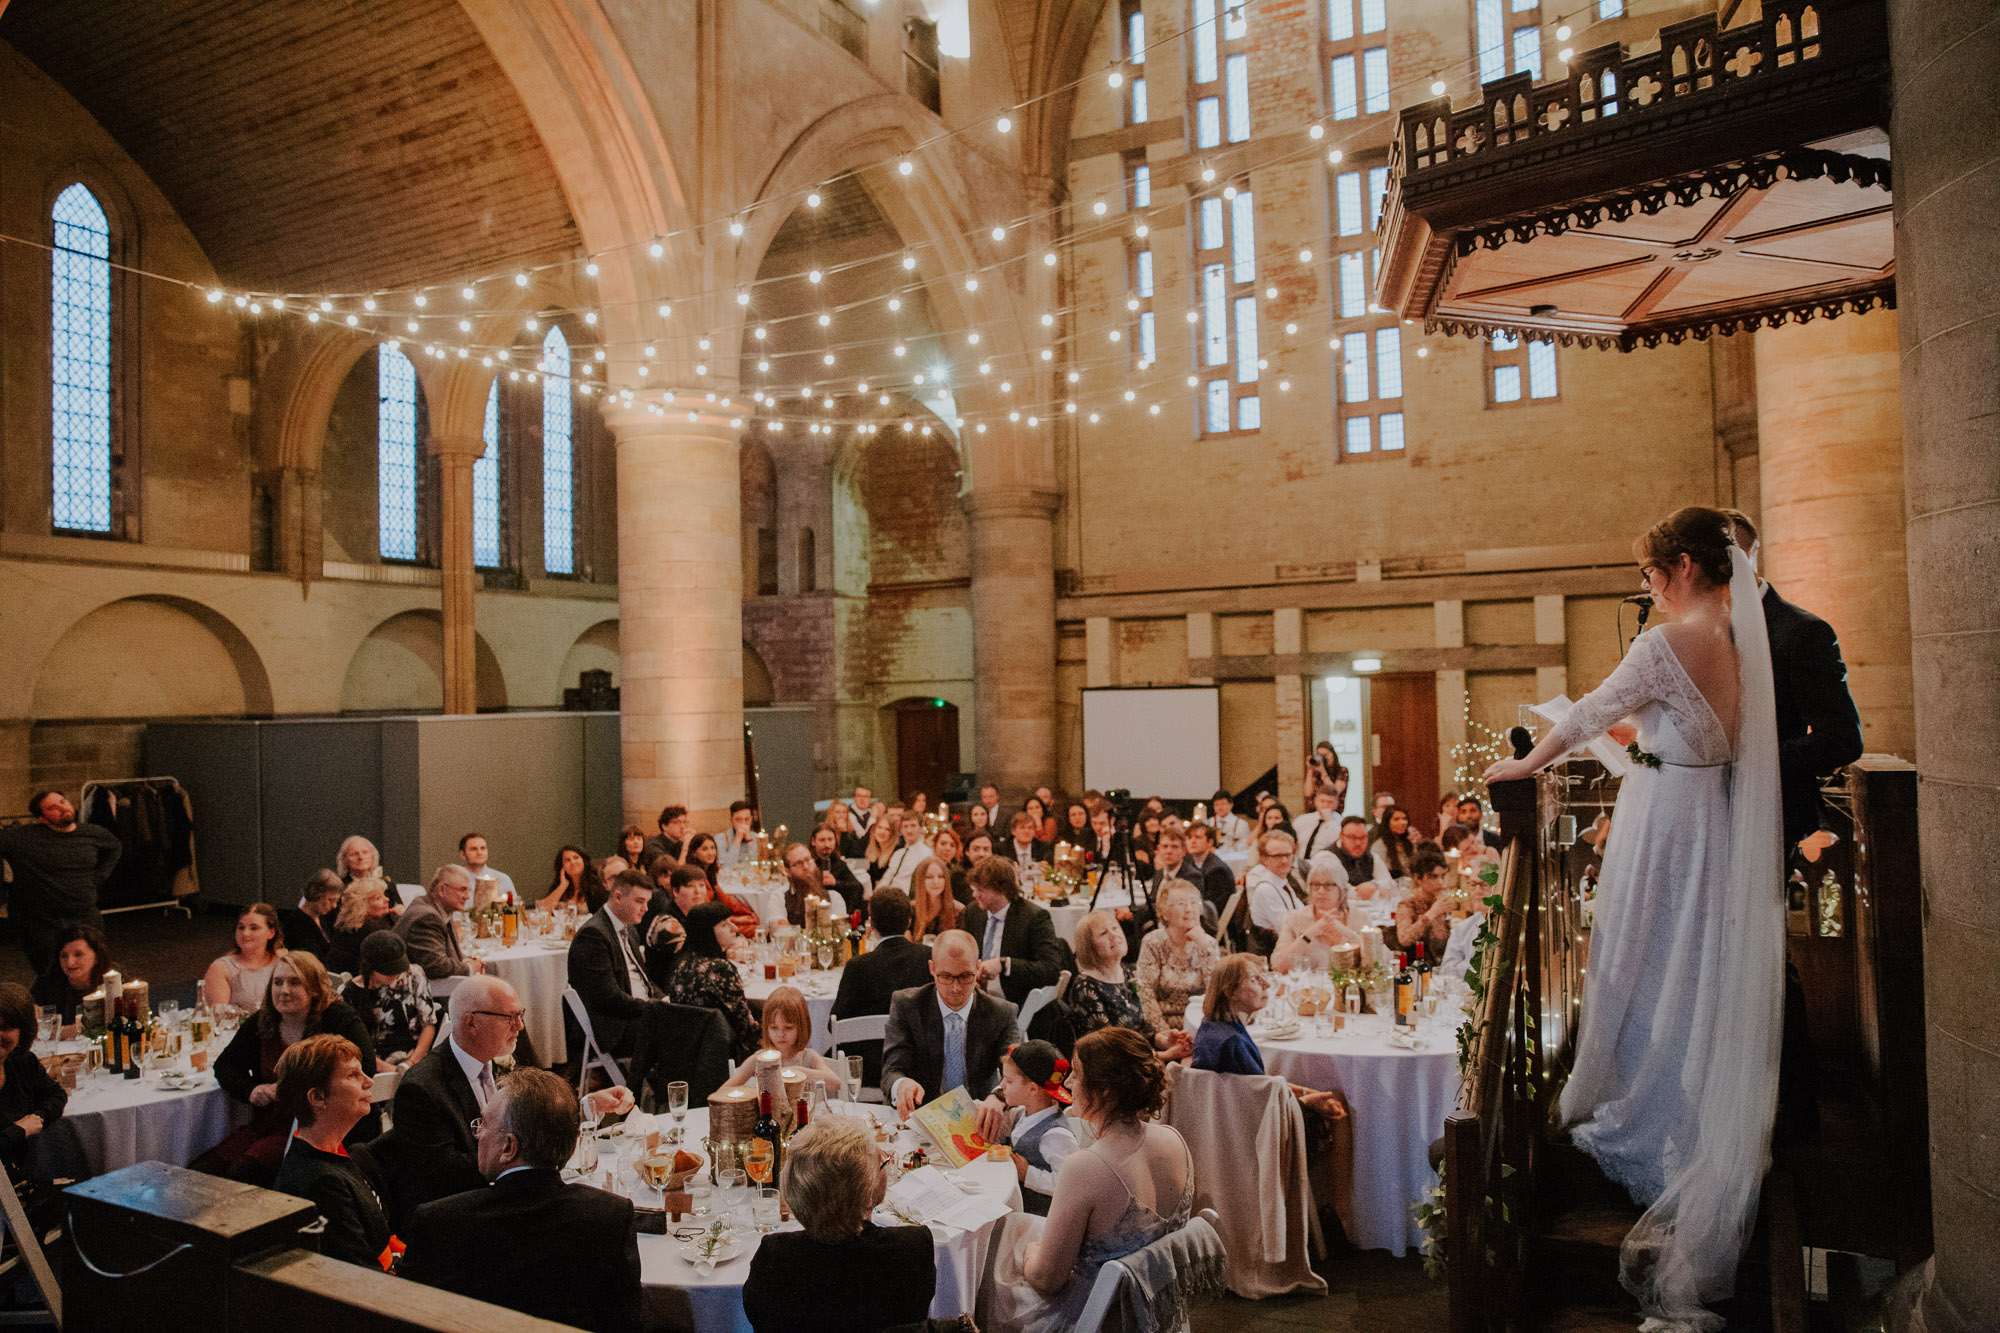 Kate-Beaumont-Bespoke-Bridal-Dahlia-Lace-Wedding-Gown-Cool-Leeds-Wedding-40.jpg